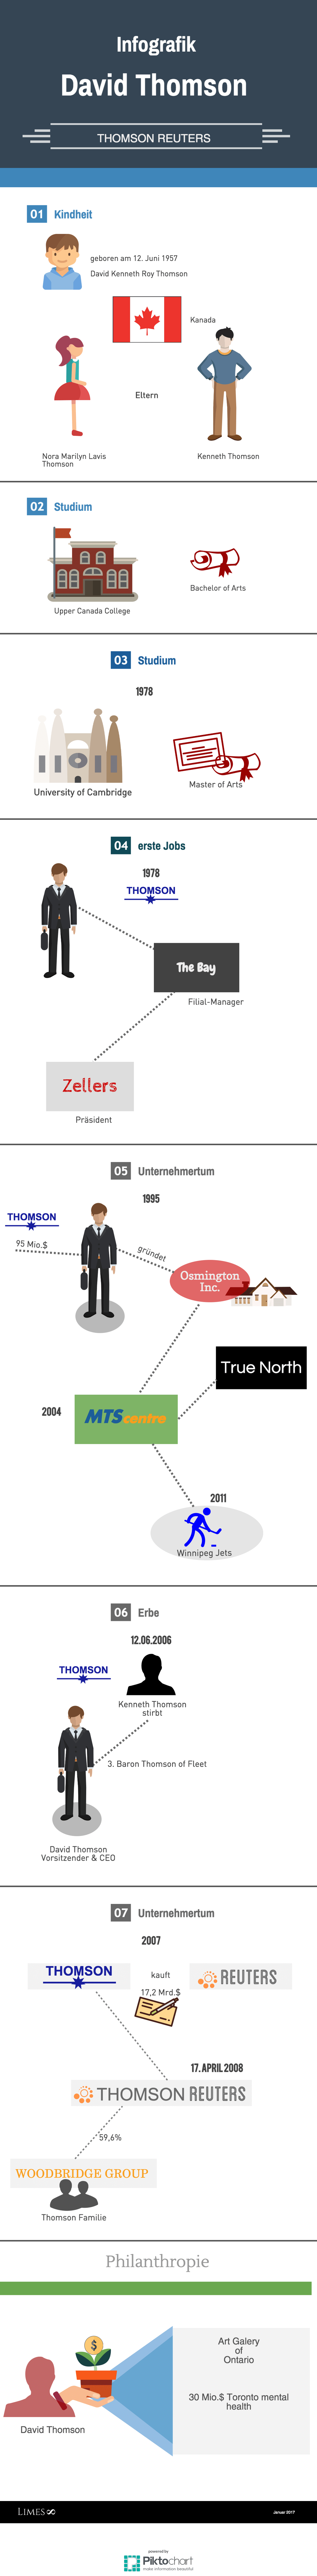 Informationsgrafik des Milliardärs David Thomson